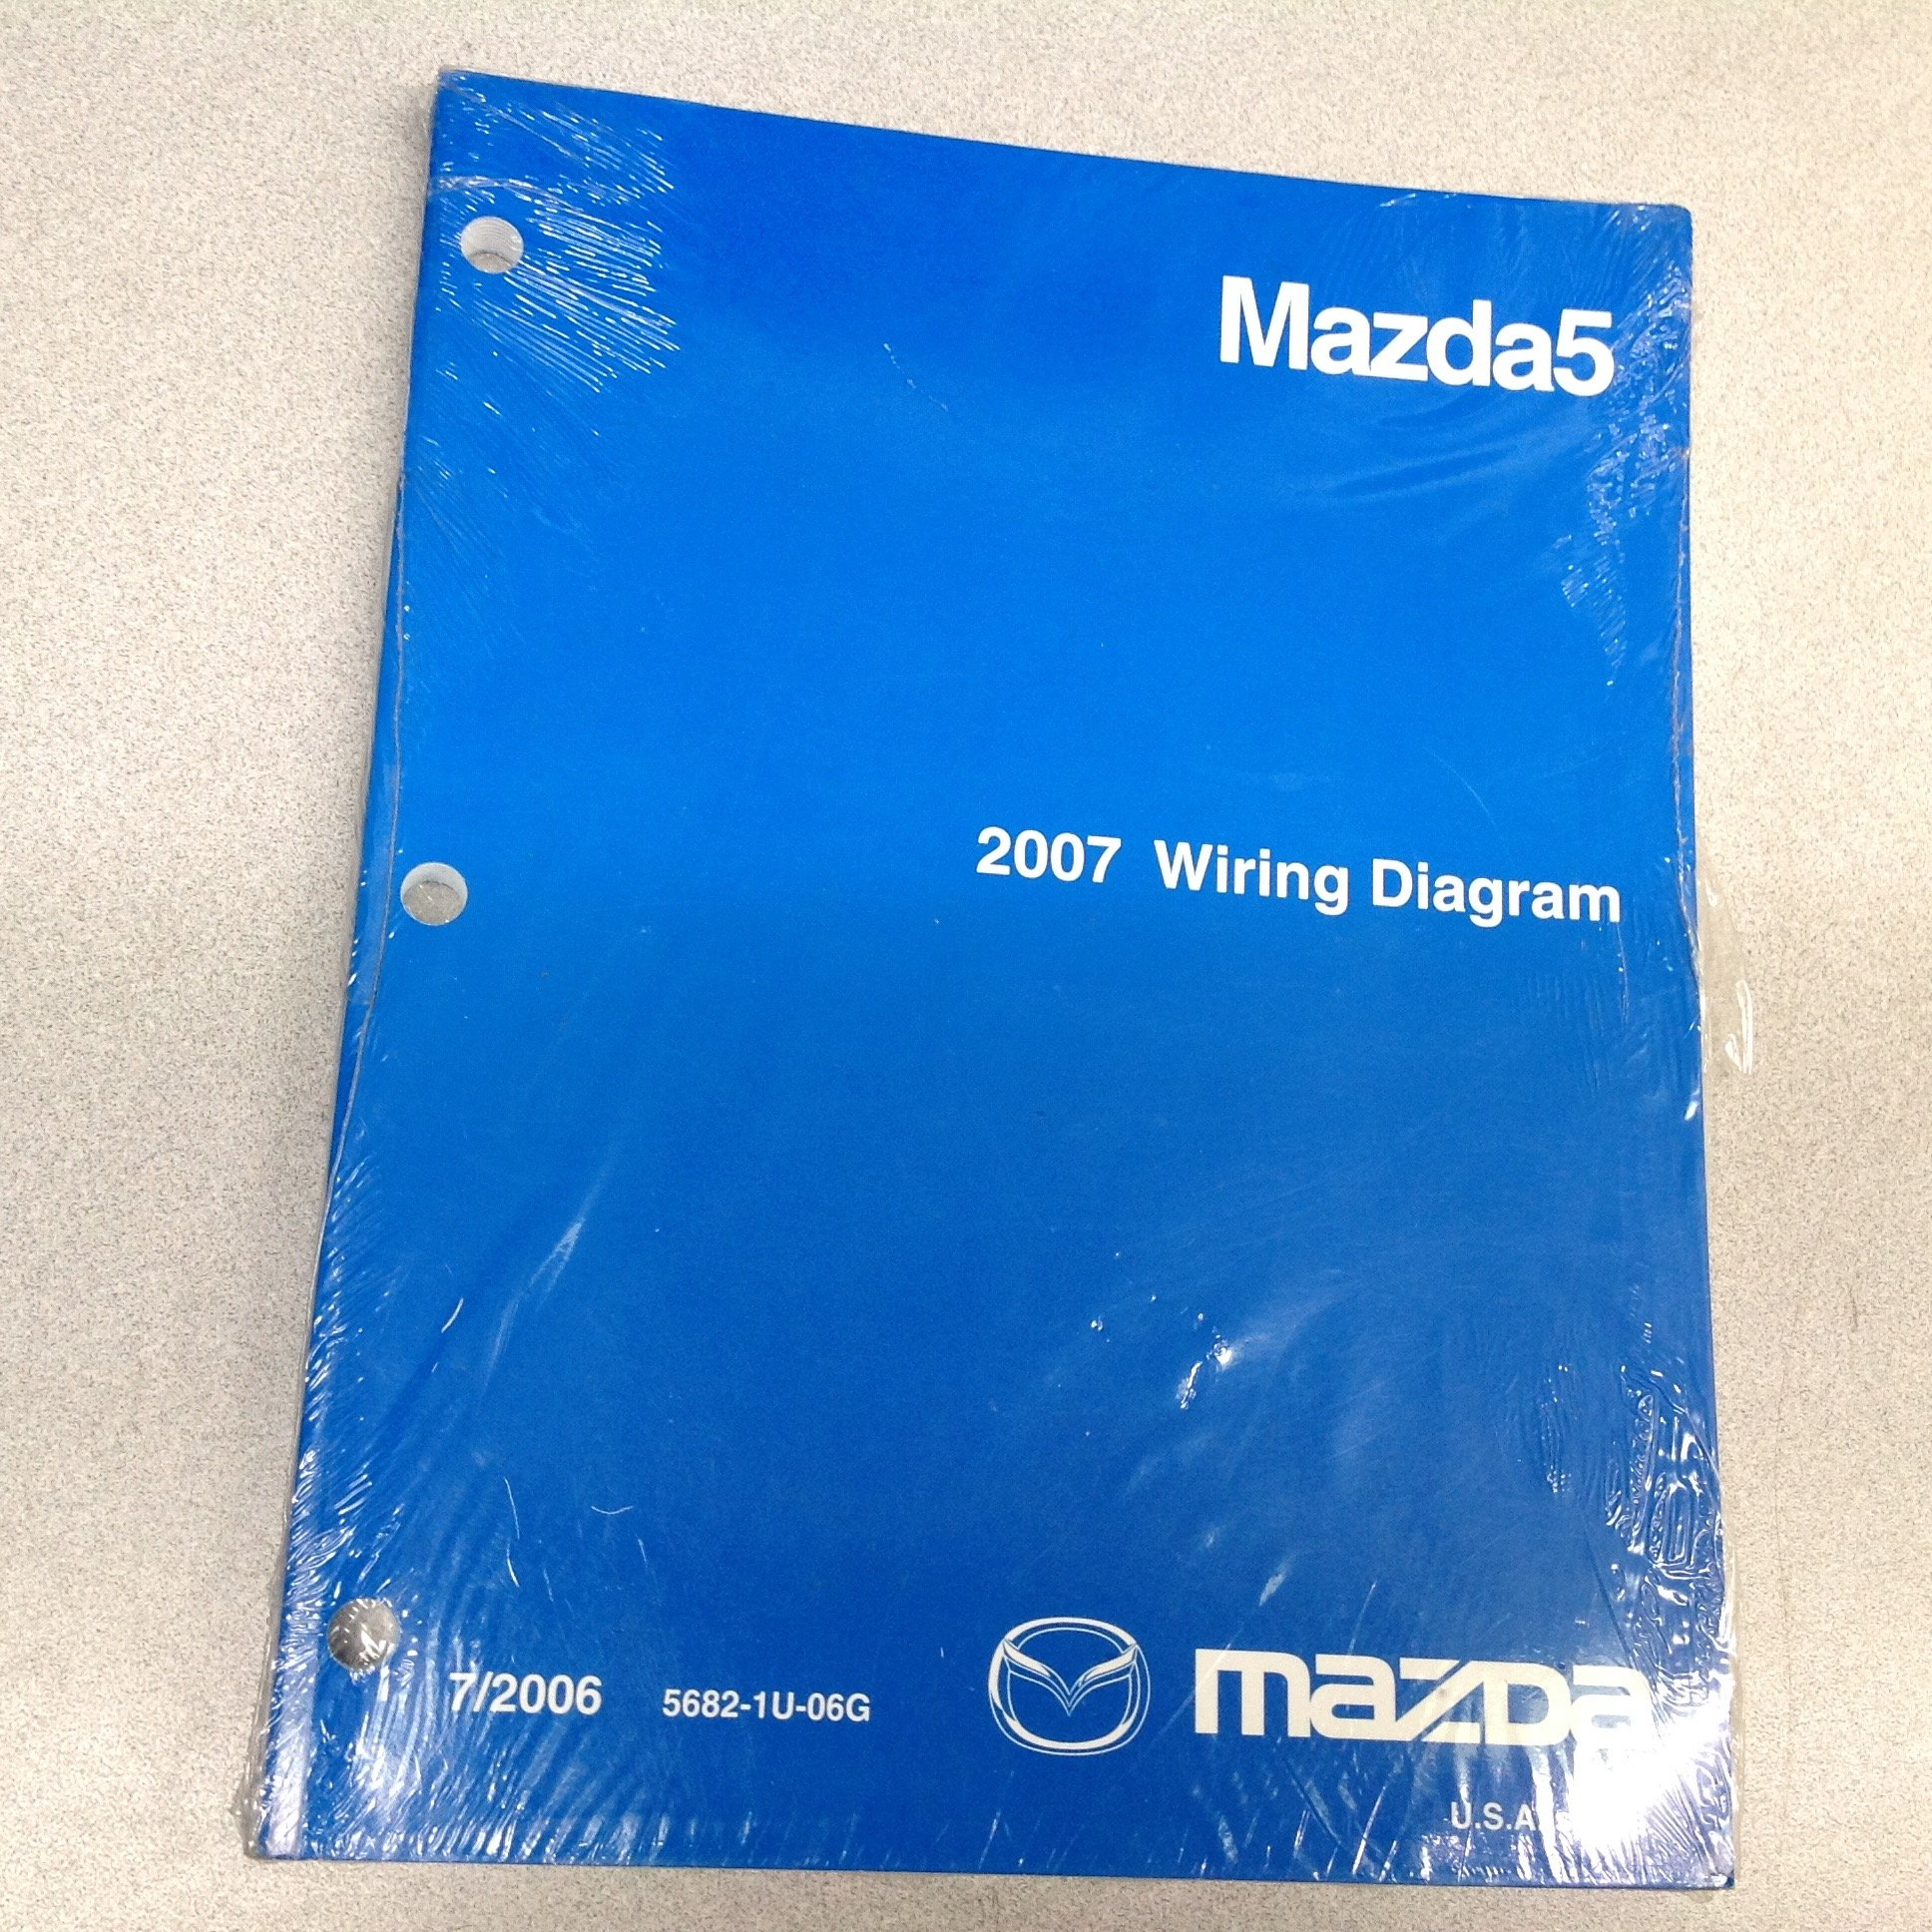 2007 mazda5 electrical wiring diagram troubleshooting shop manual rh amazon com mazda 5 electrical wiring diagram mazda 5 2005 wiring diagram